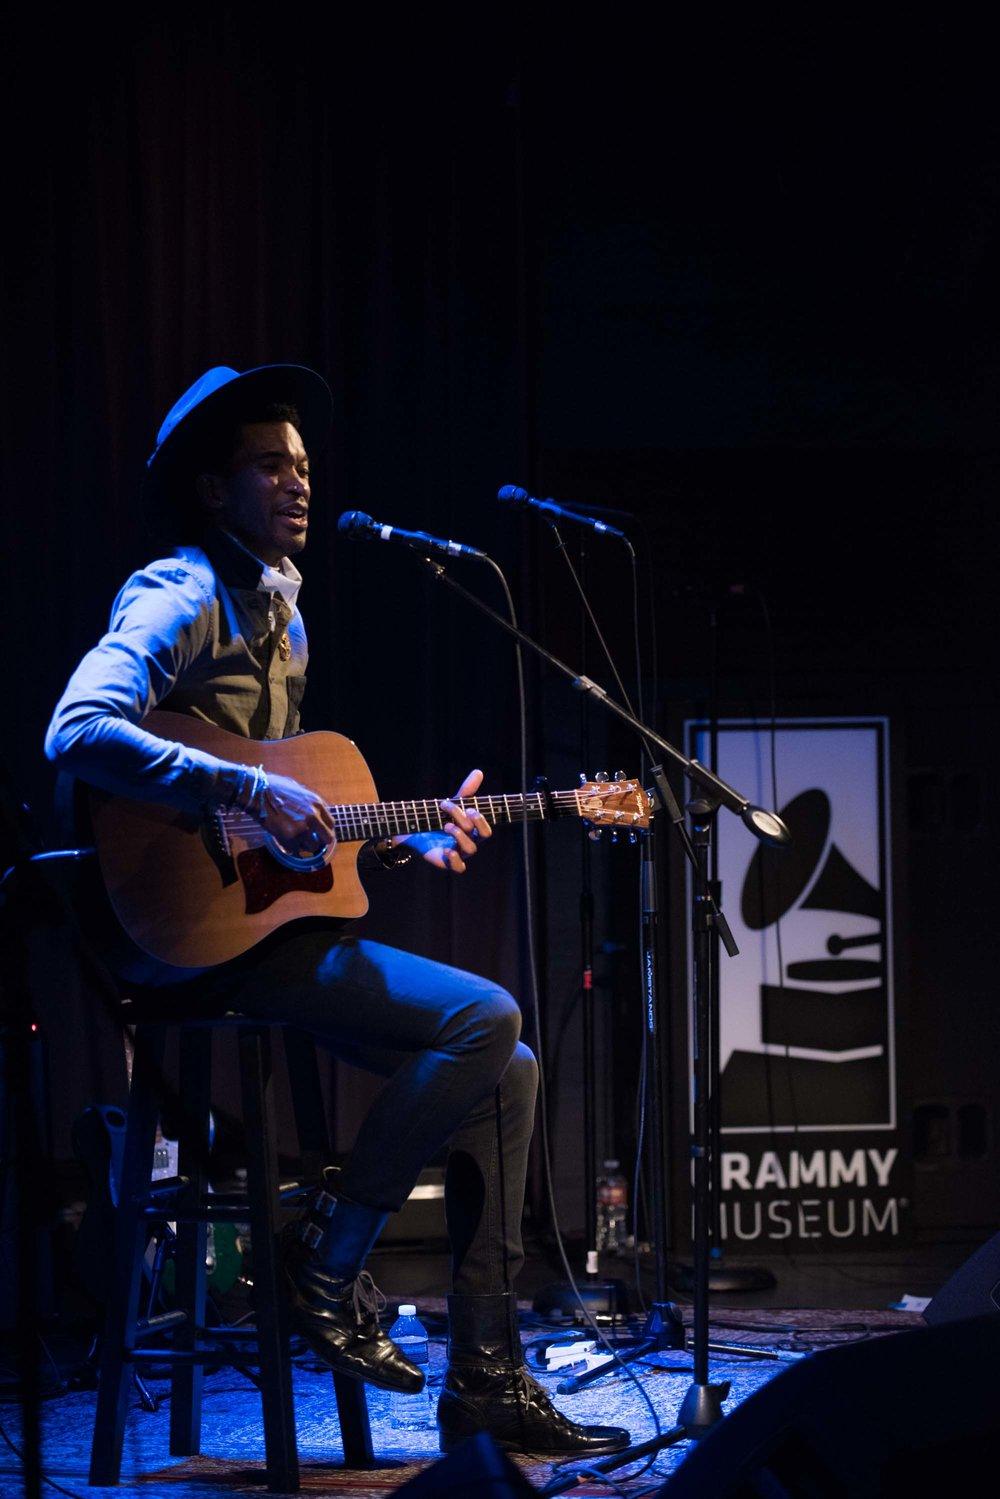 Live Debut @grammymuseum